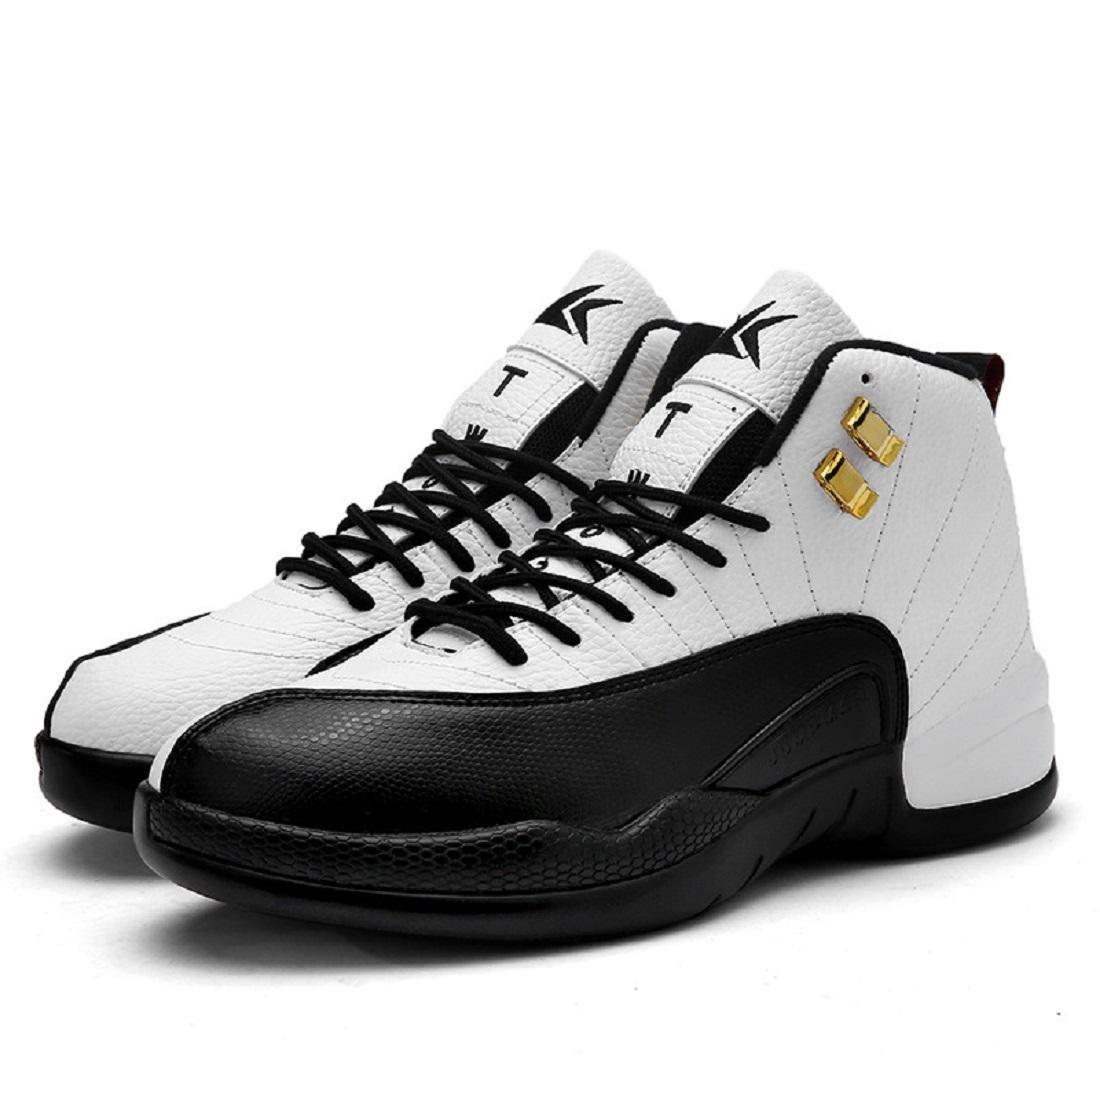 Herren Winter Das neue Basketball Schuhe Rutschfest Sportschuhe Atmungsaktiv Schutzfuß Trainer Laufschuhe EUR GRÖSSE 39-44